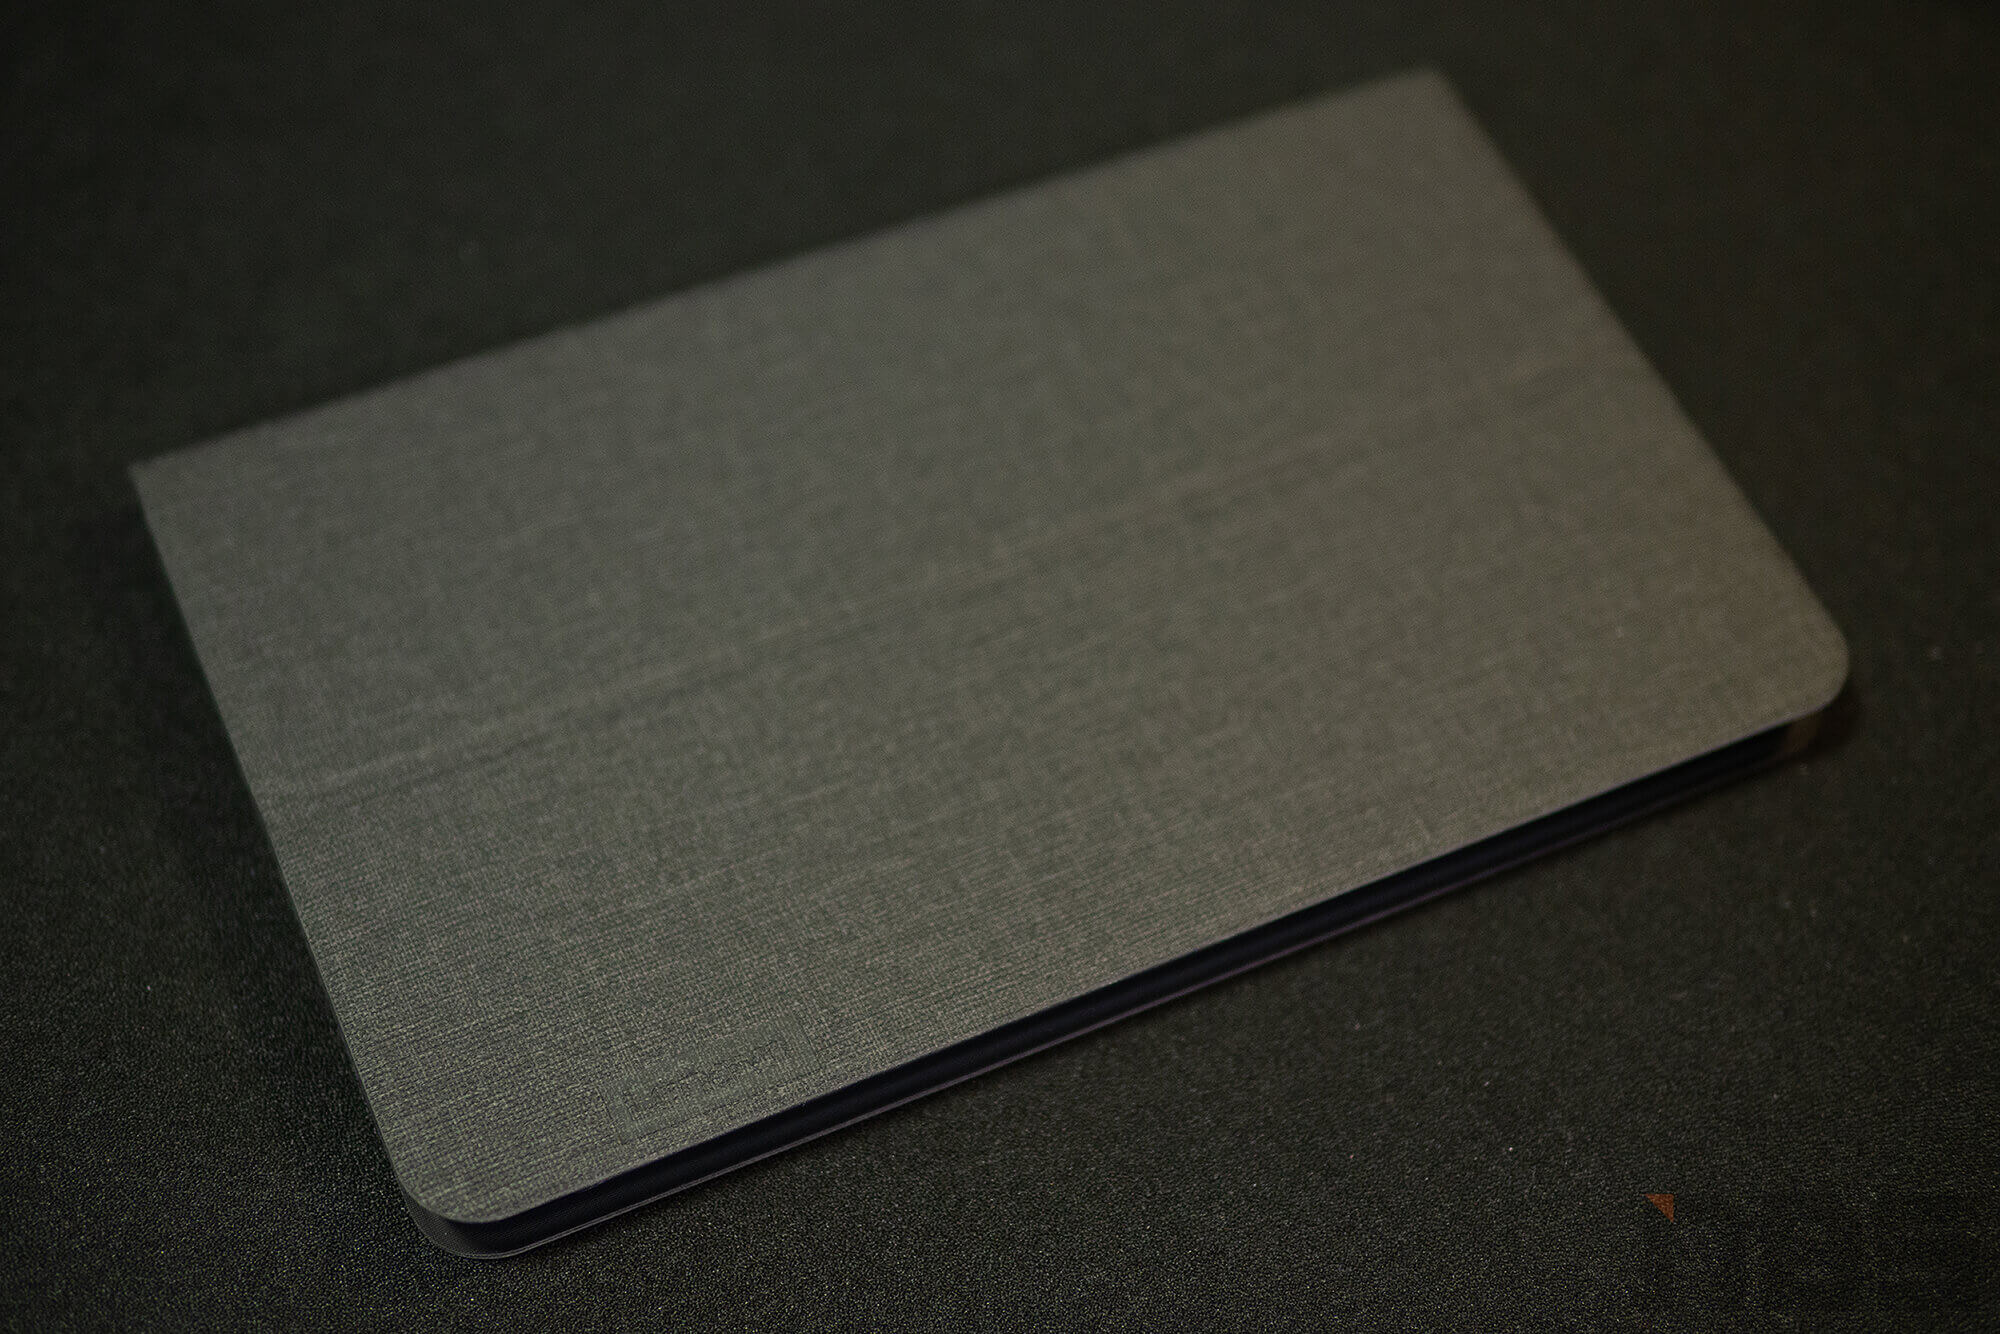 Review Lenovo Tab M8 NotebookSPEC 46